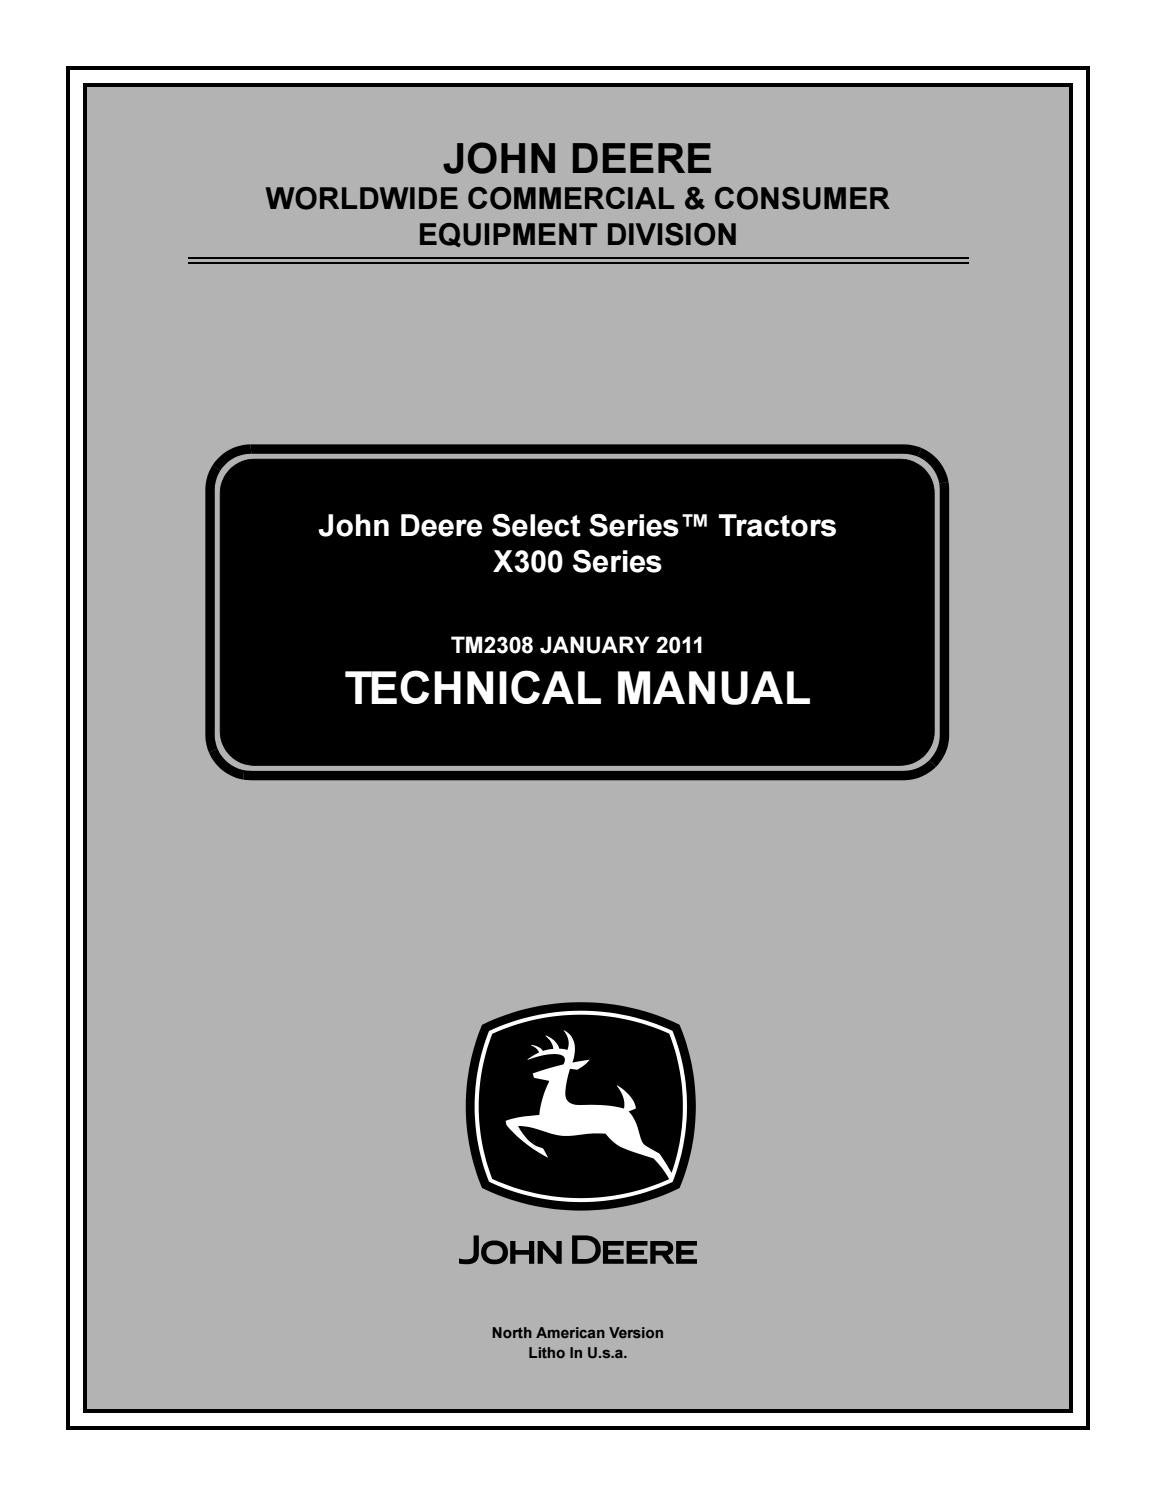 John deere x300 lawn tractor service repair manual by